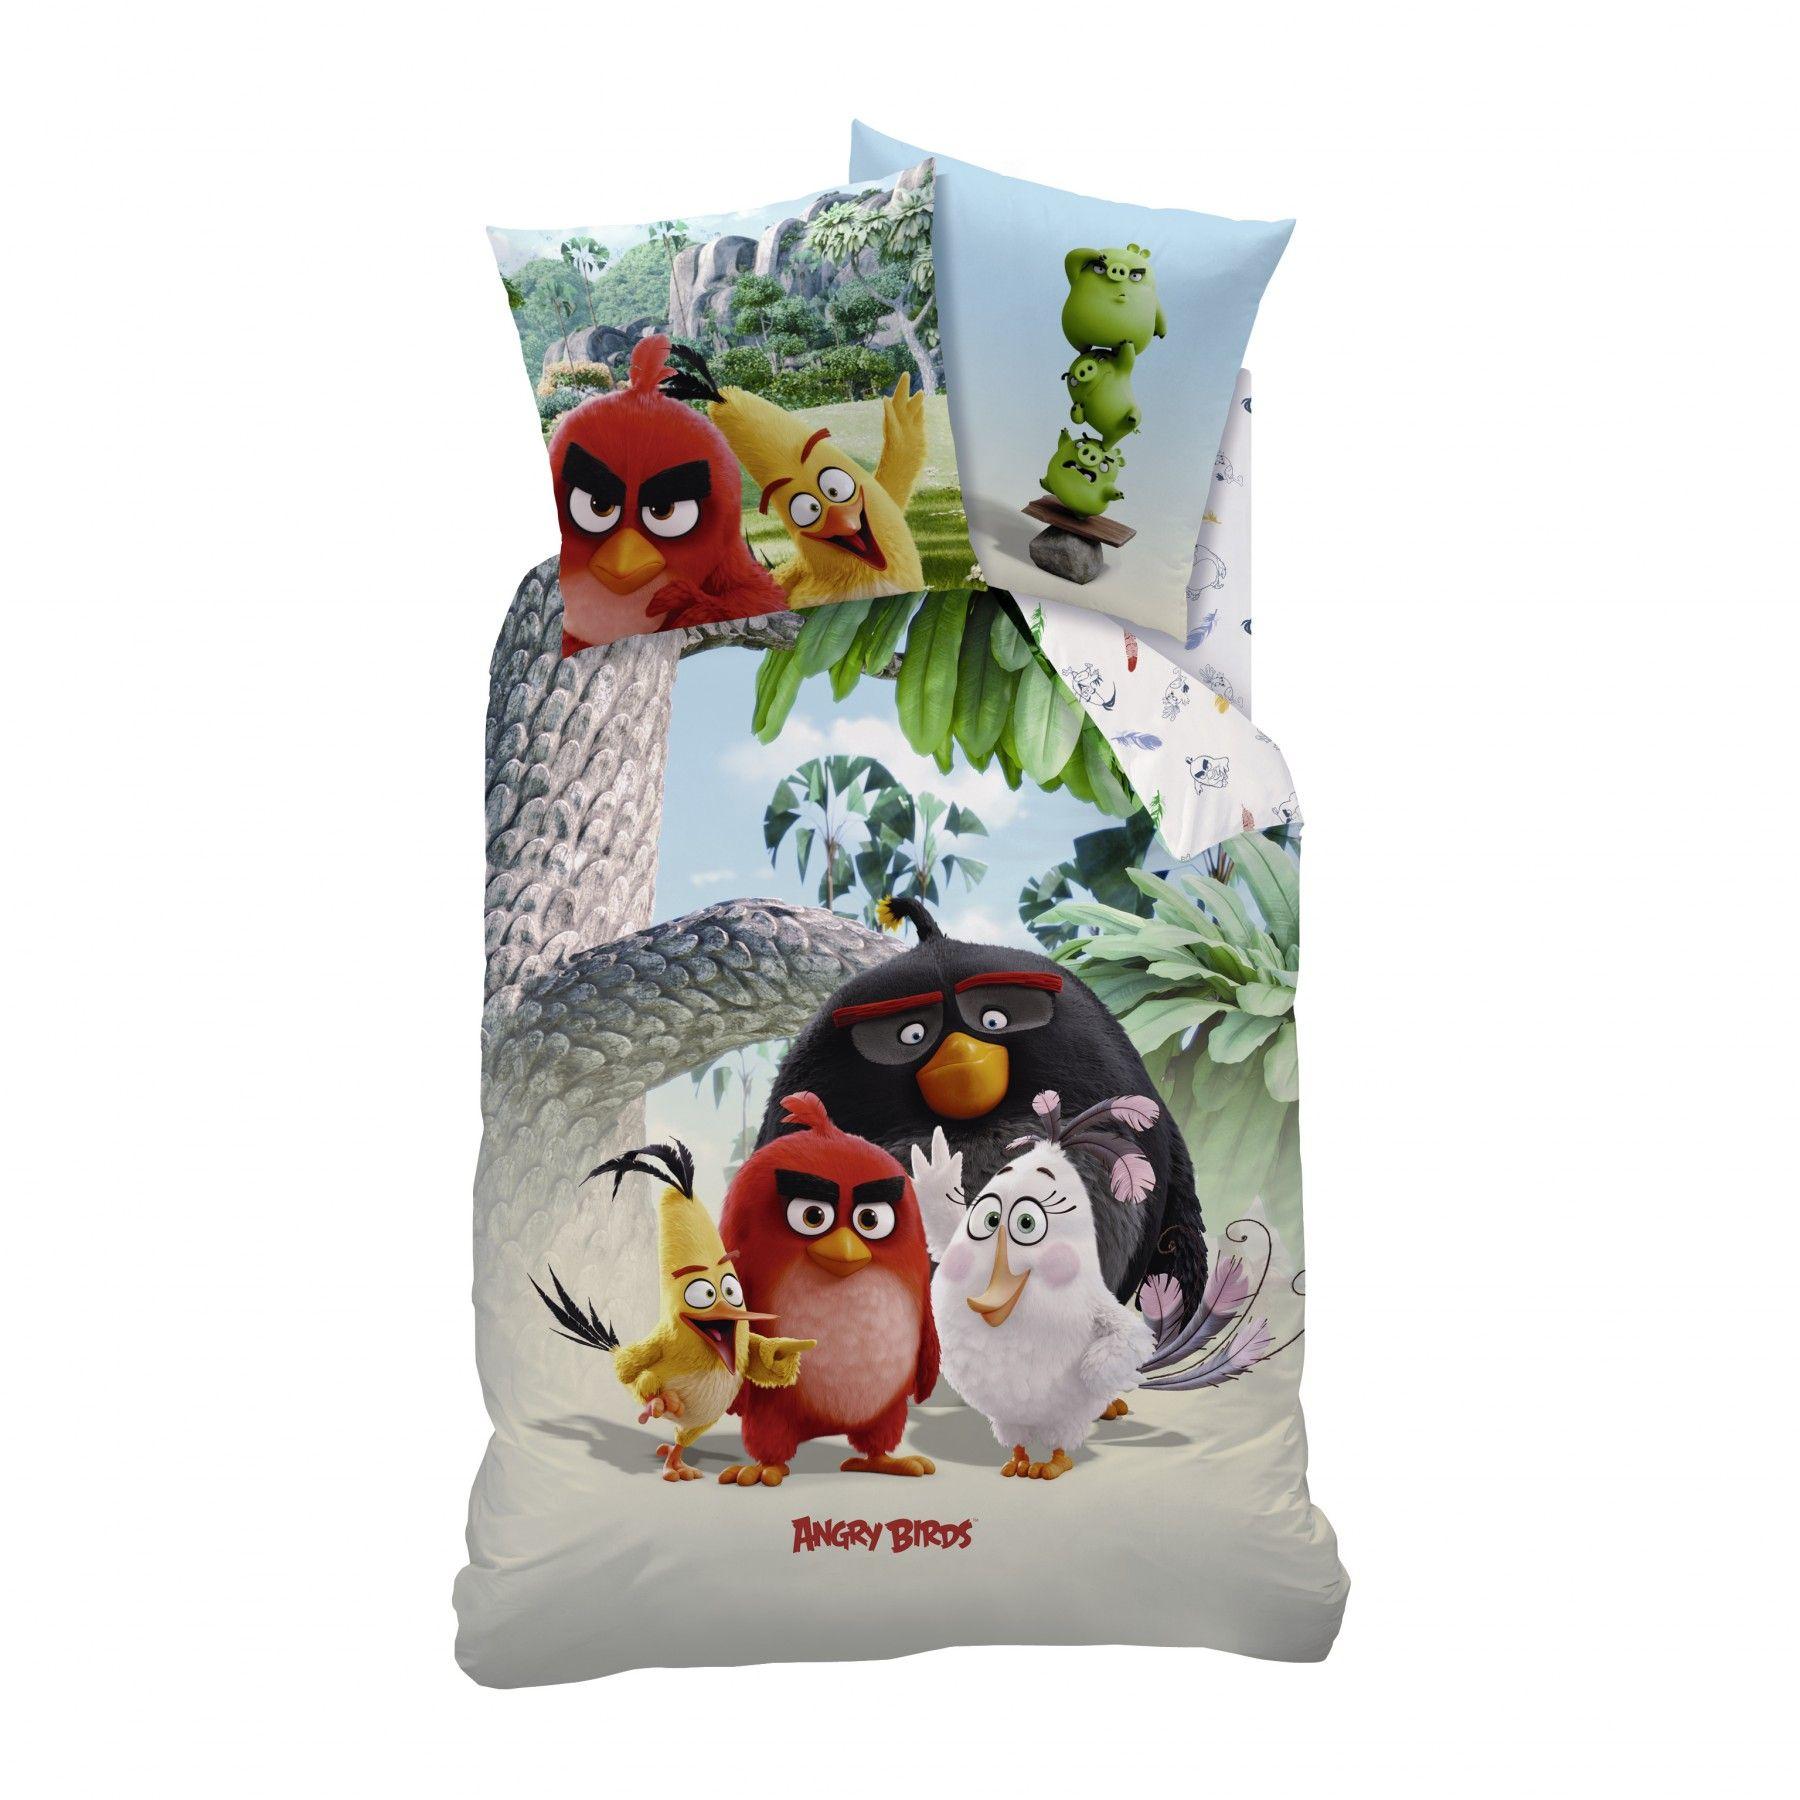 ANGRY BIRDS Bettwäsche bunt